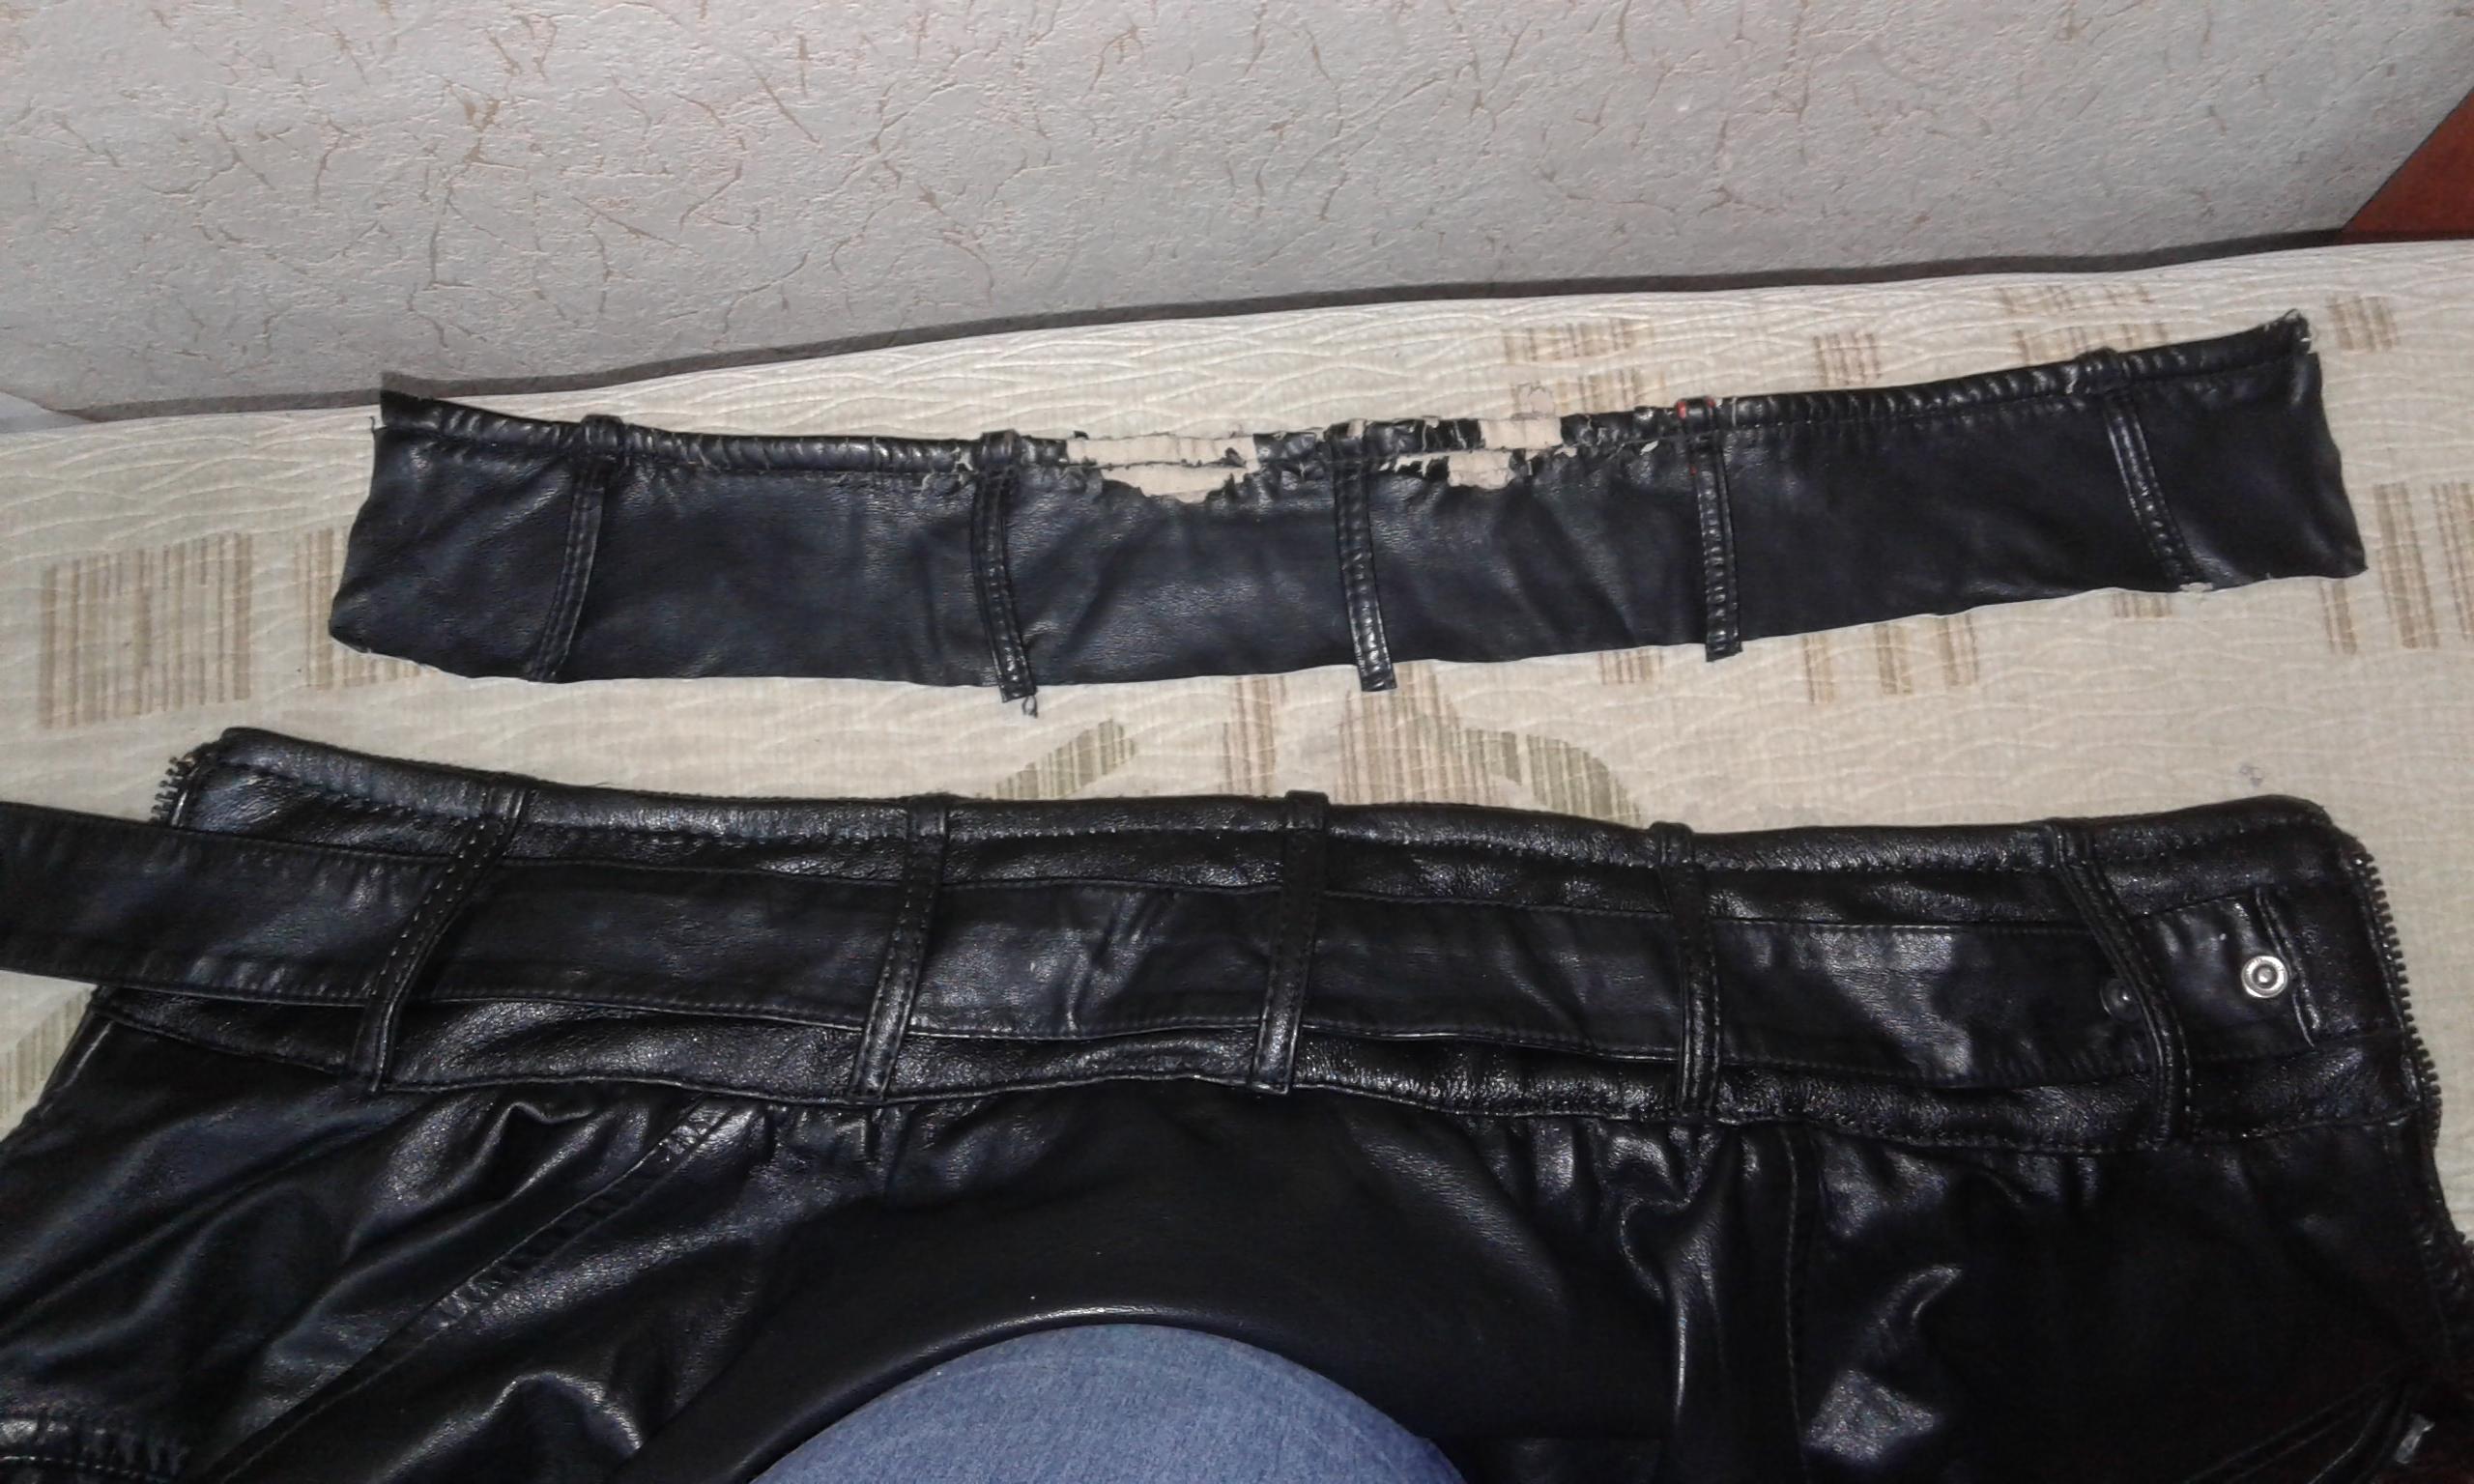 Фото Замена воротника куртки из кожи. Работа заняла один день